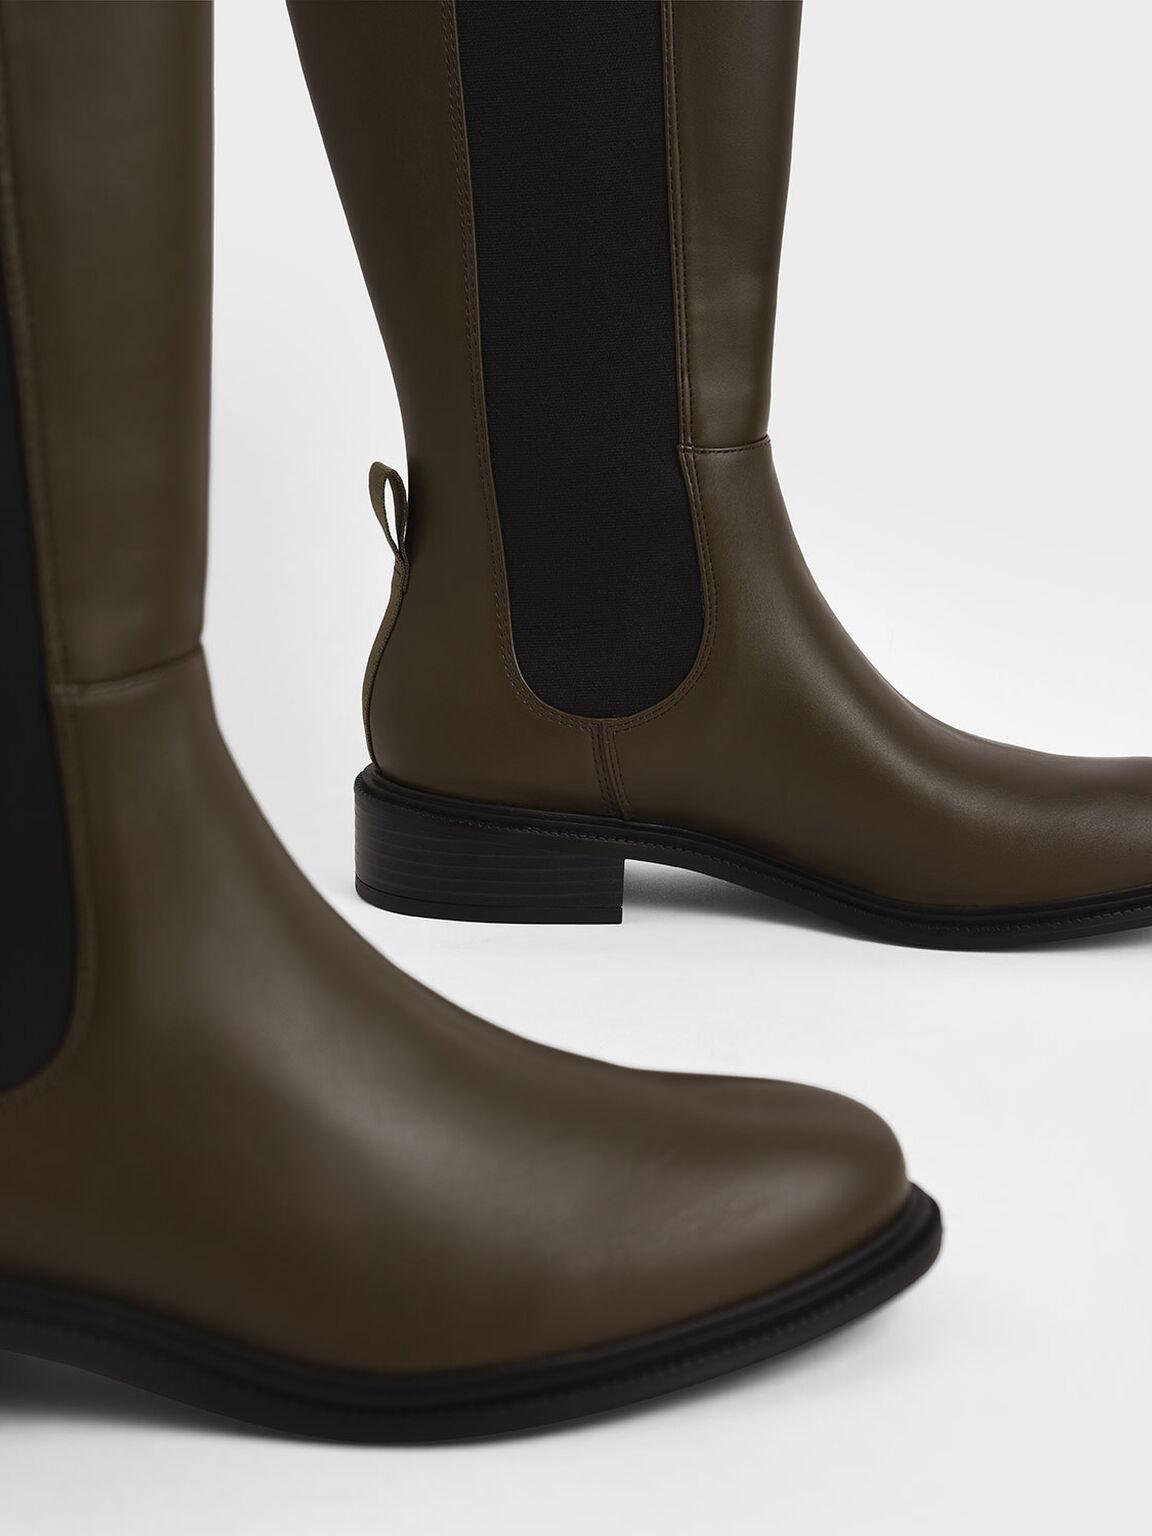 彈性帶拼接長靴, 橄欖色, hi-res